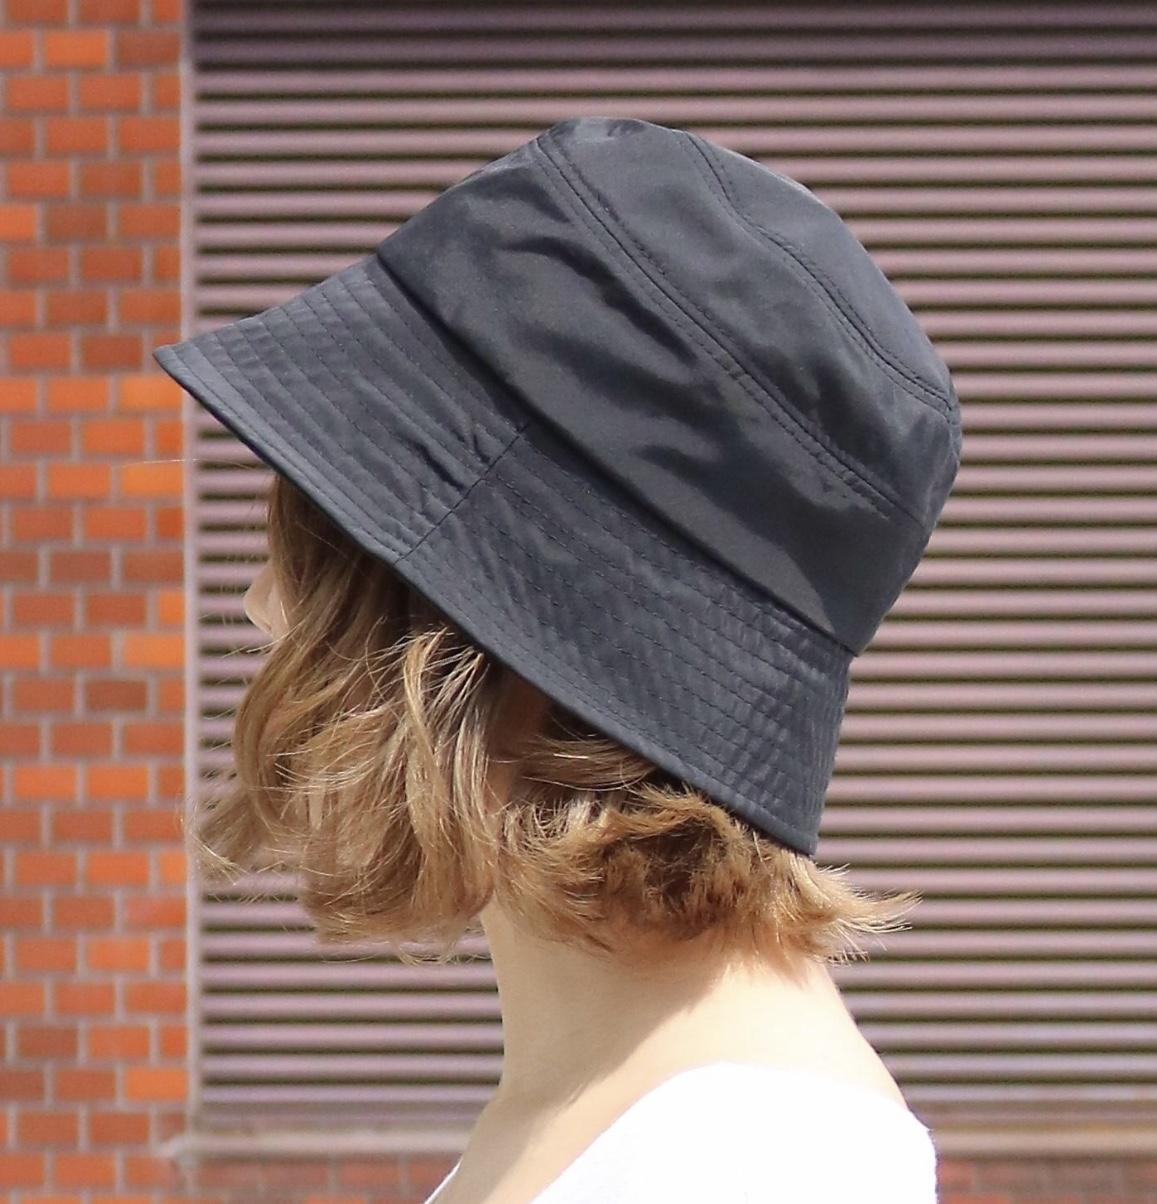 Scrap Book スクラップブック バケットハット ハット 帽子 ギフト 母の日ギフト ポリエステル トレンド 日本ブランド